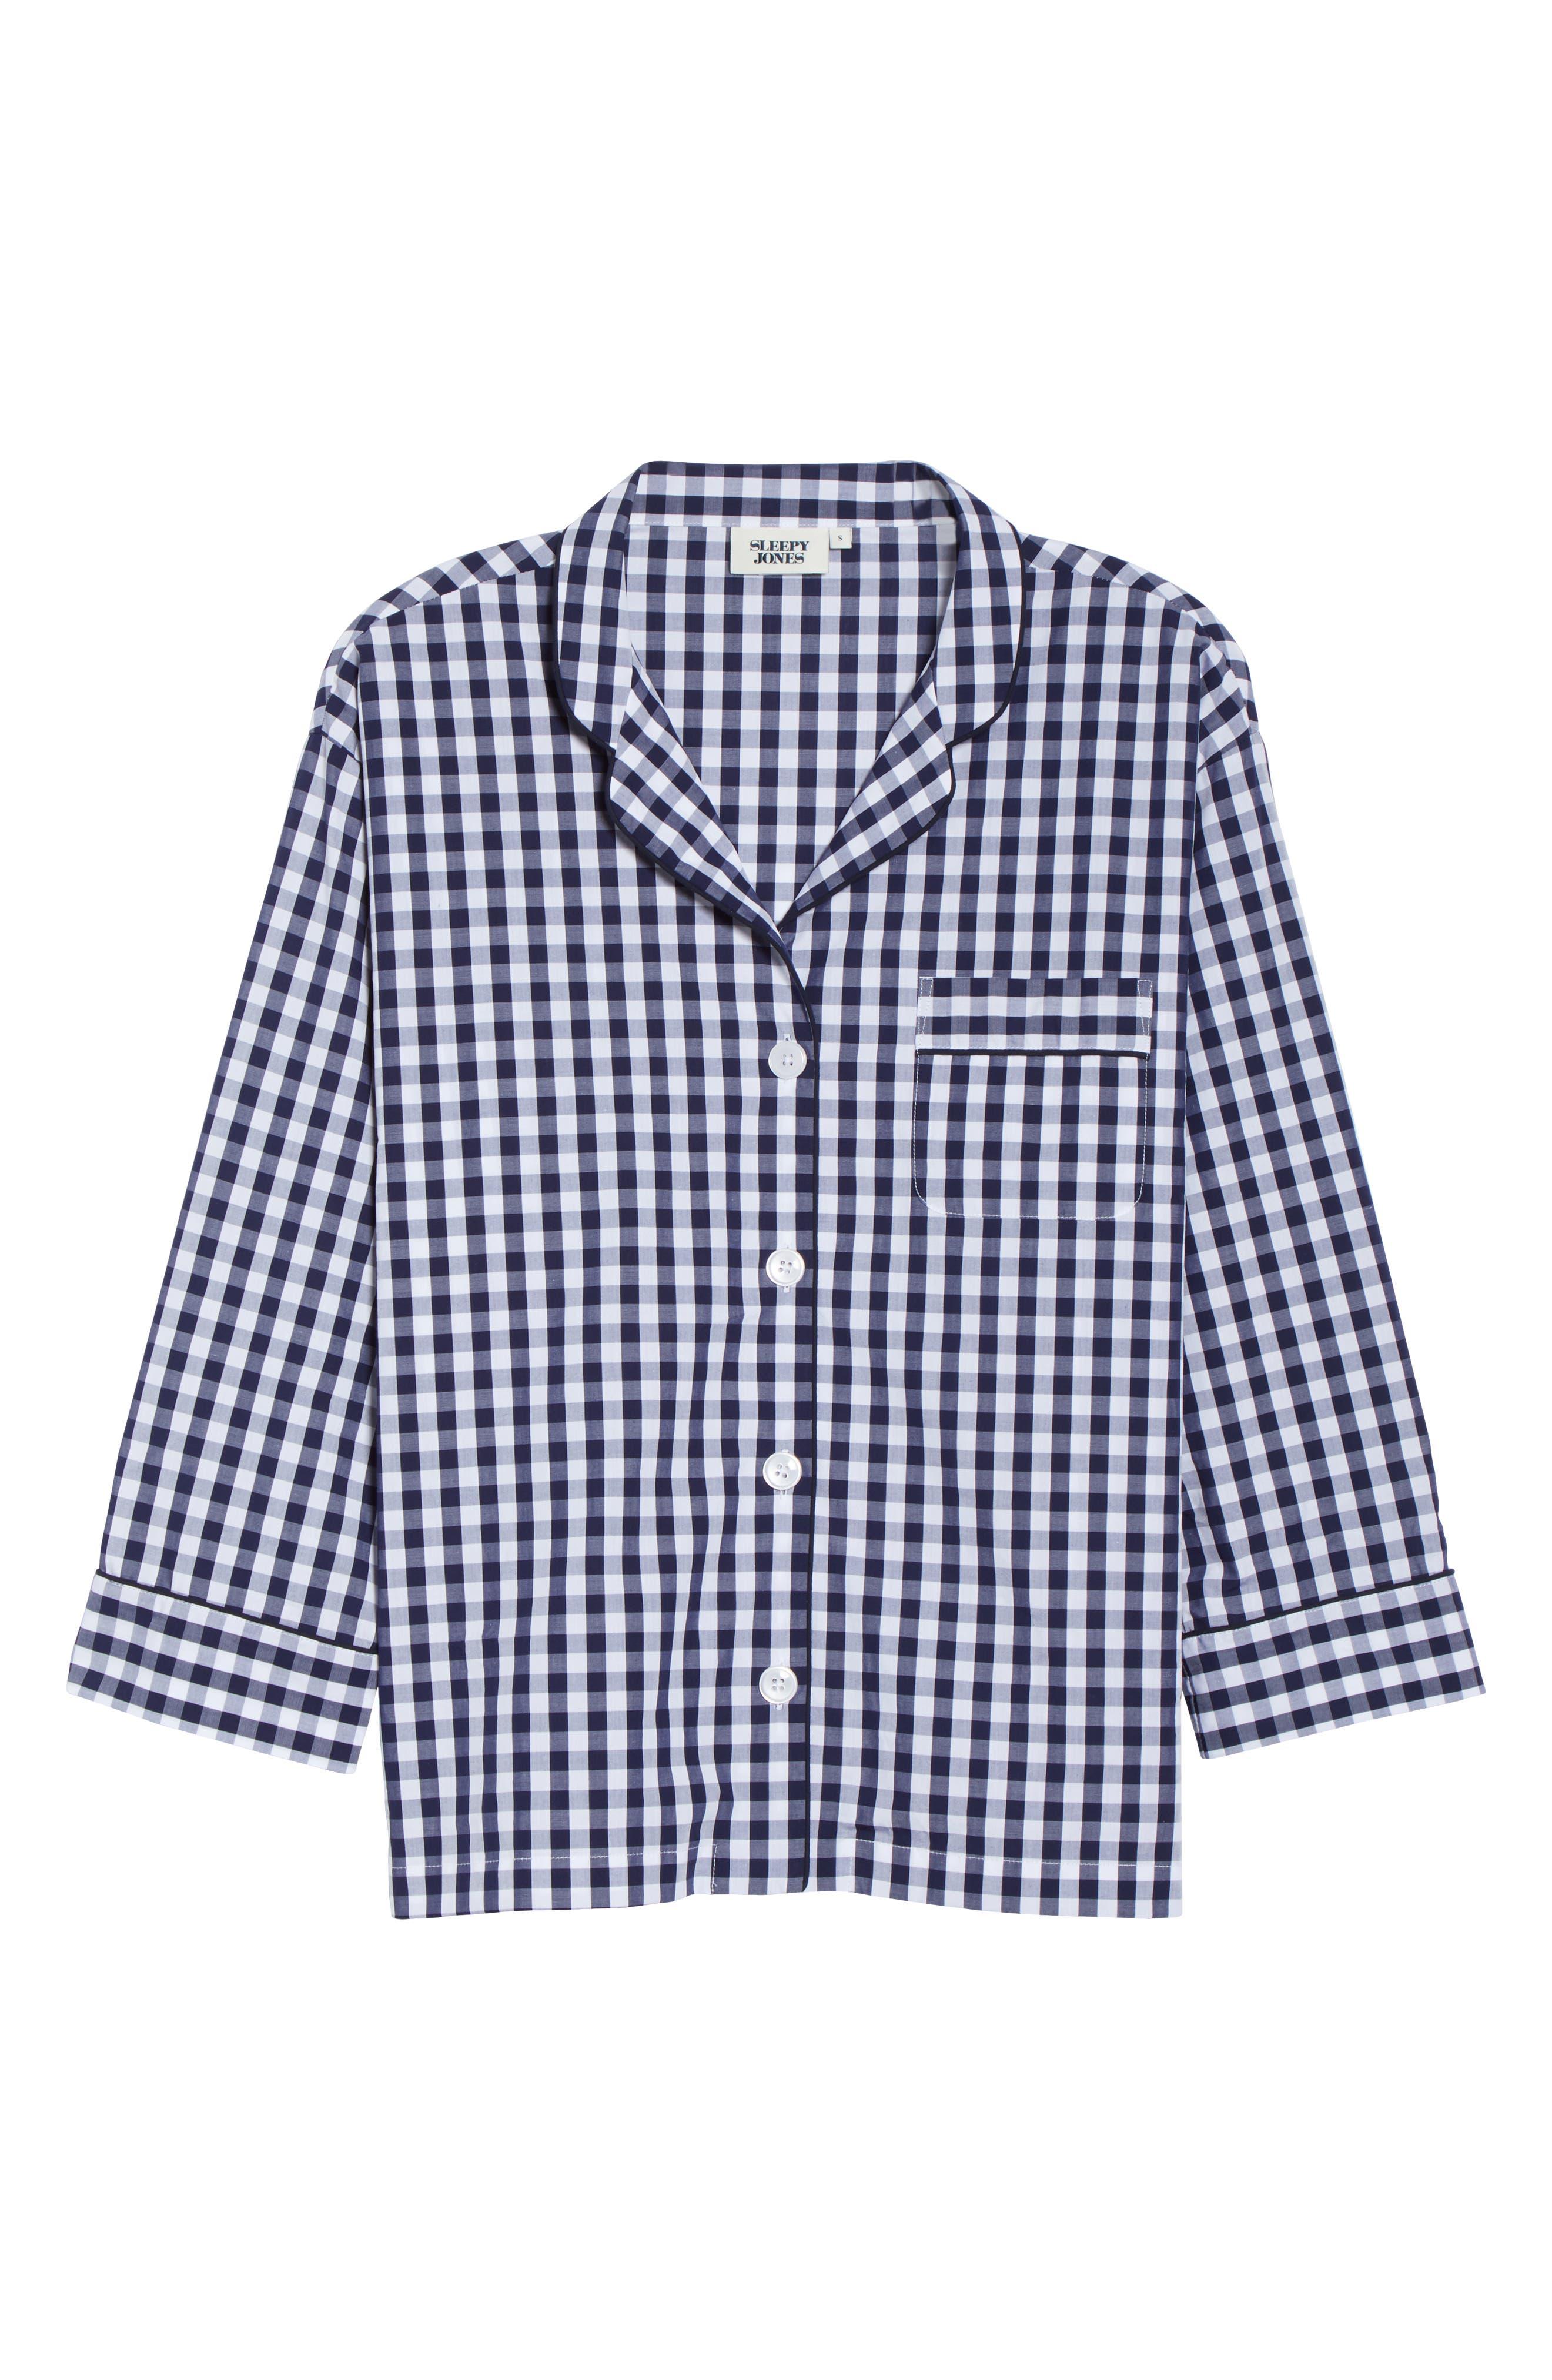 SLEEPY JONES Pajama Shirt in Large Gingham Blue